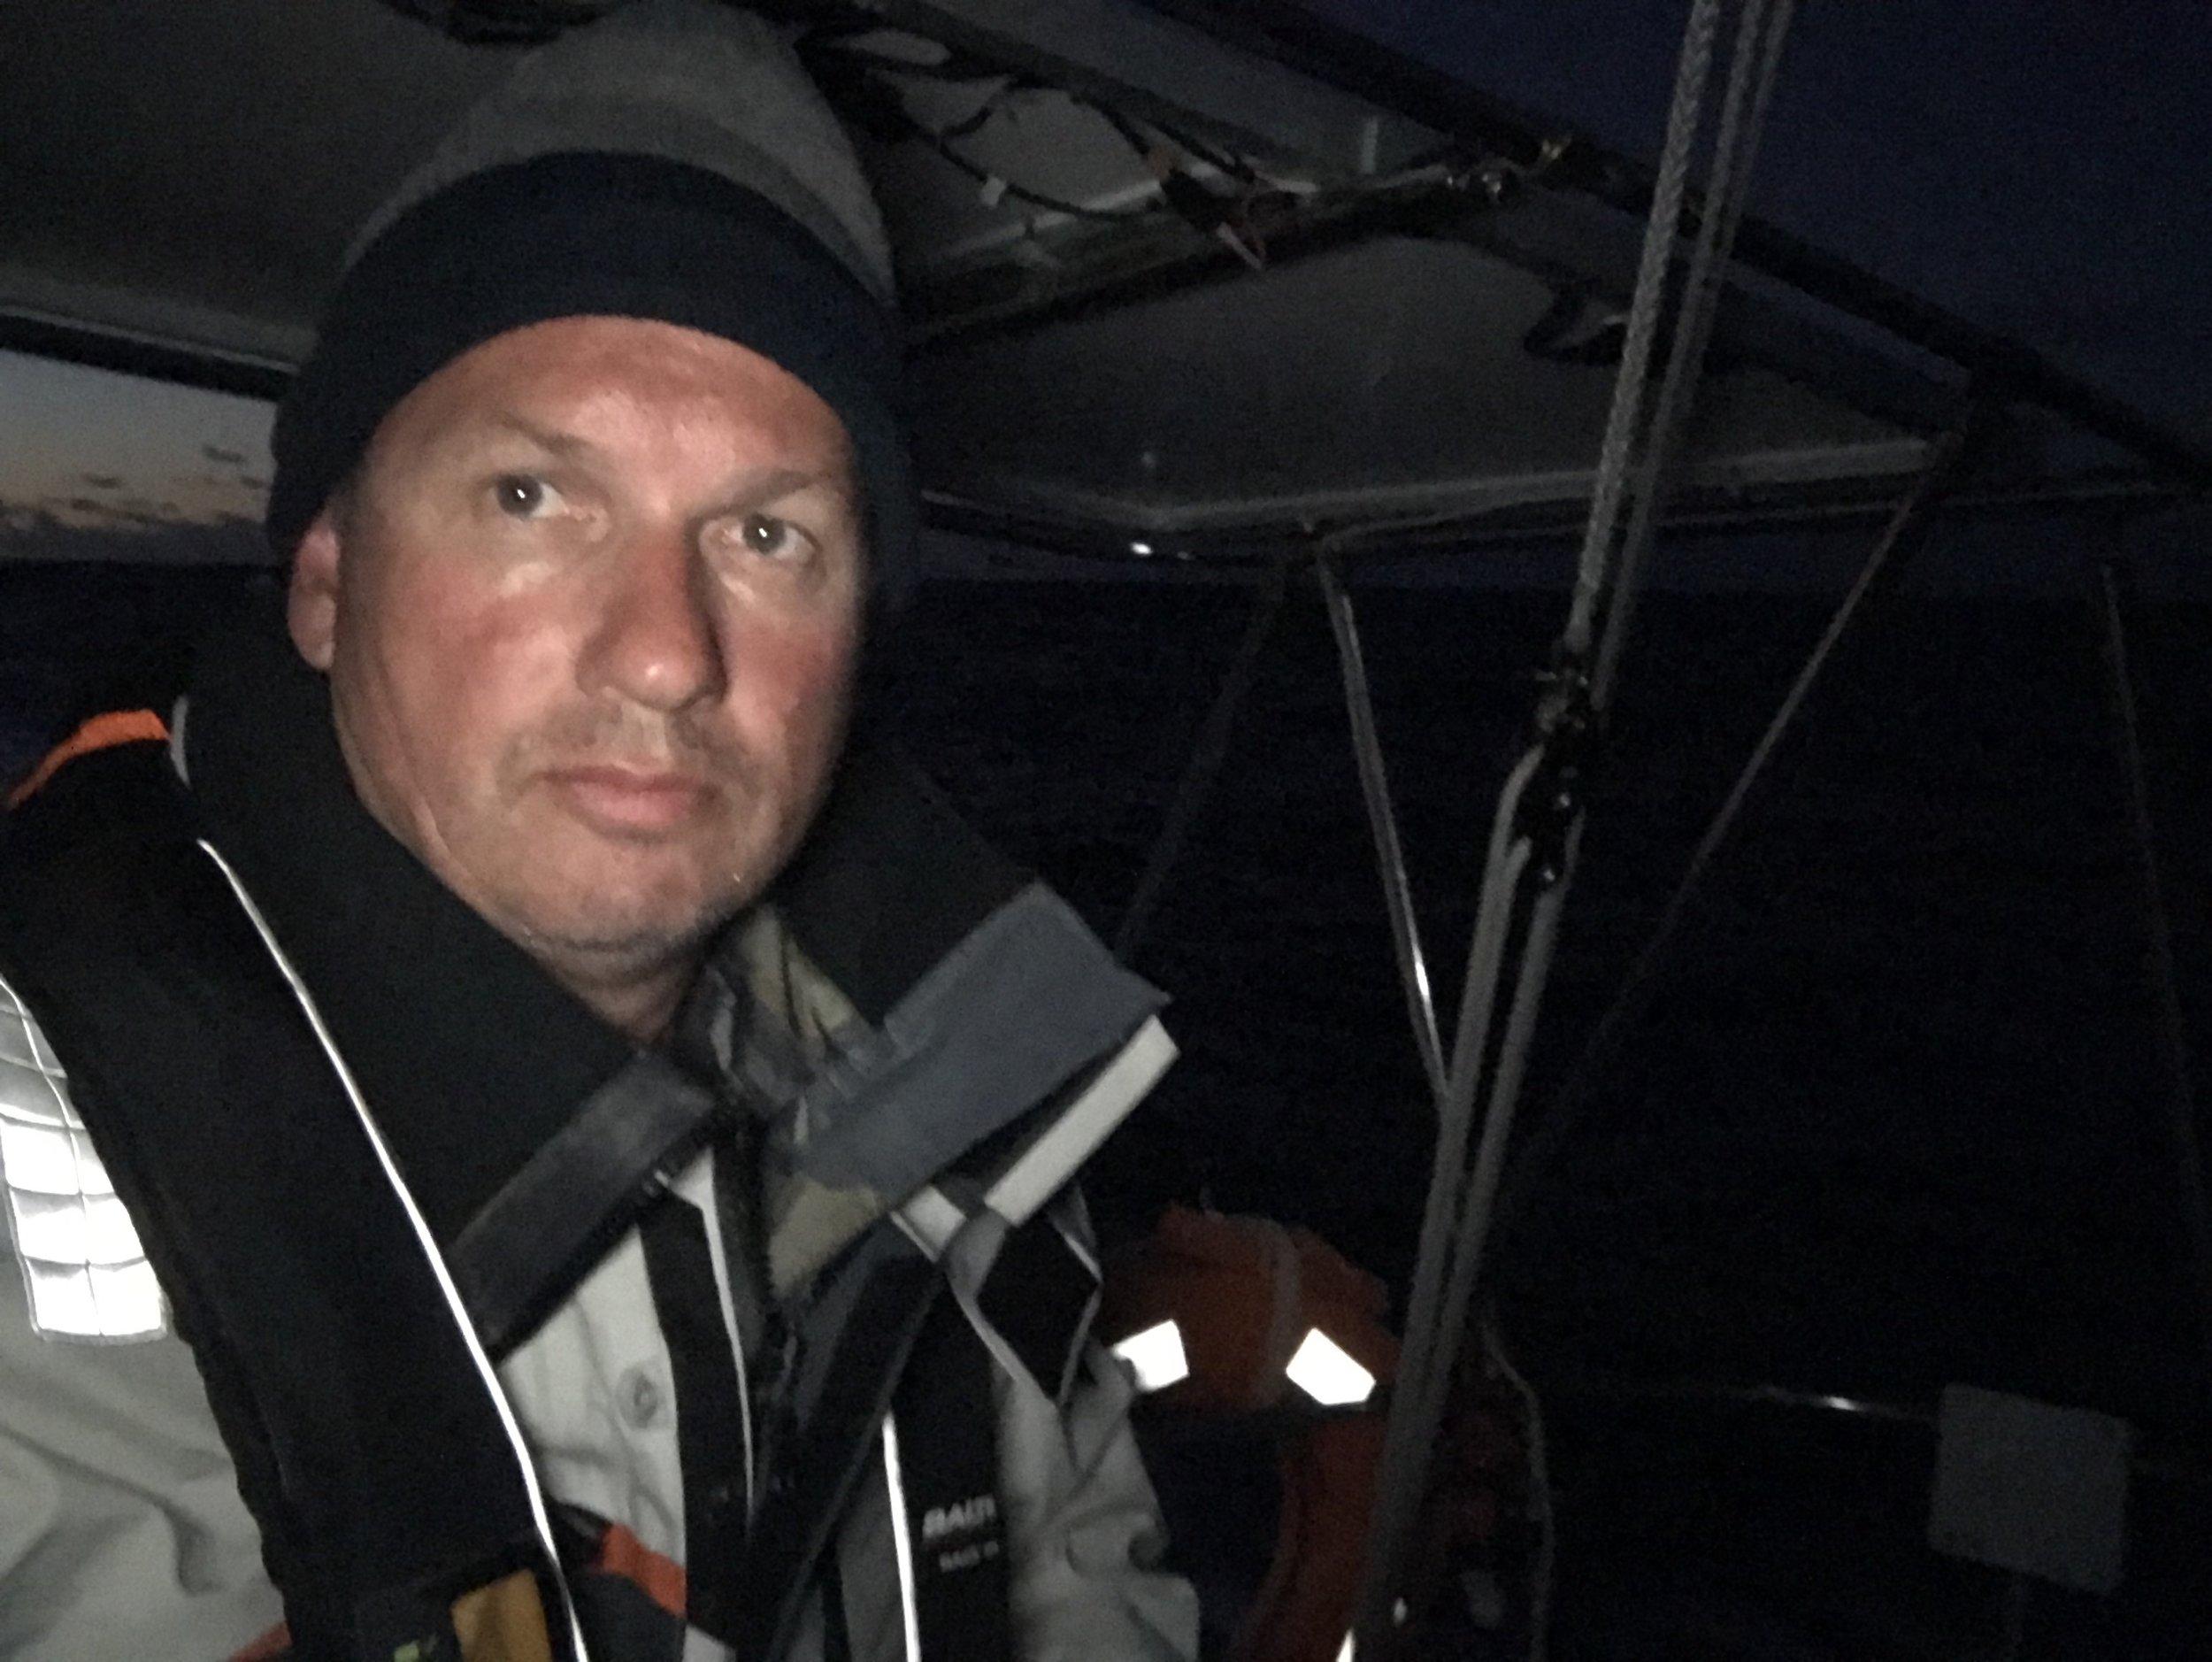 David Hows Tasman Sea crossing Beneteau